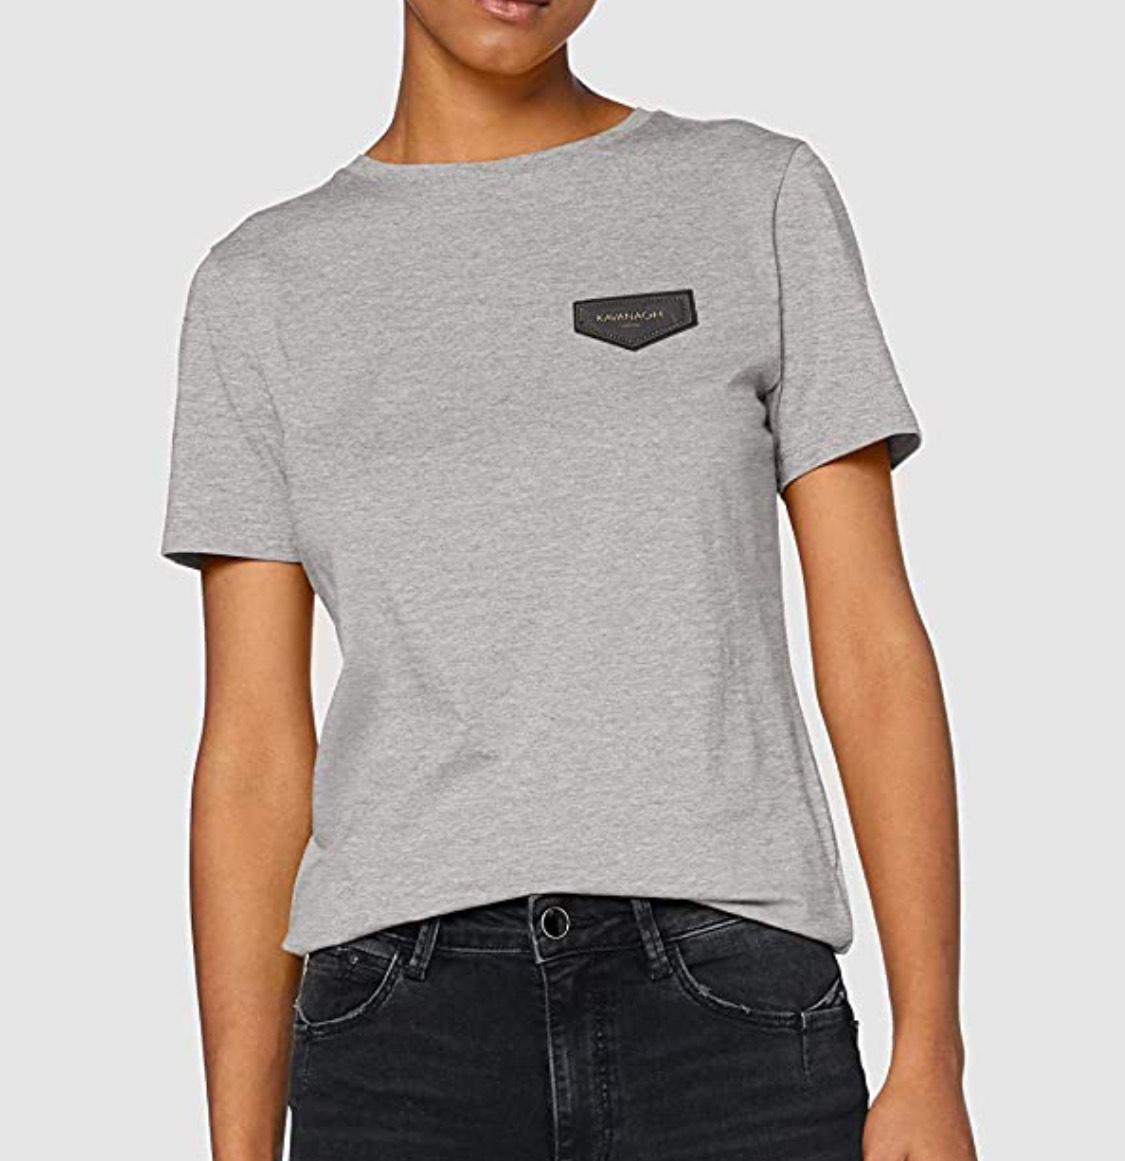 Camiseta Gianni Kavanagh mujer talla L.